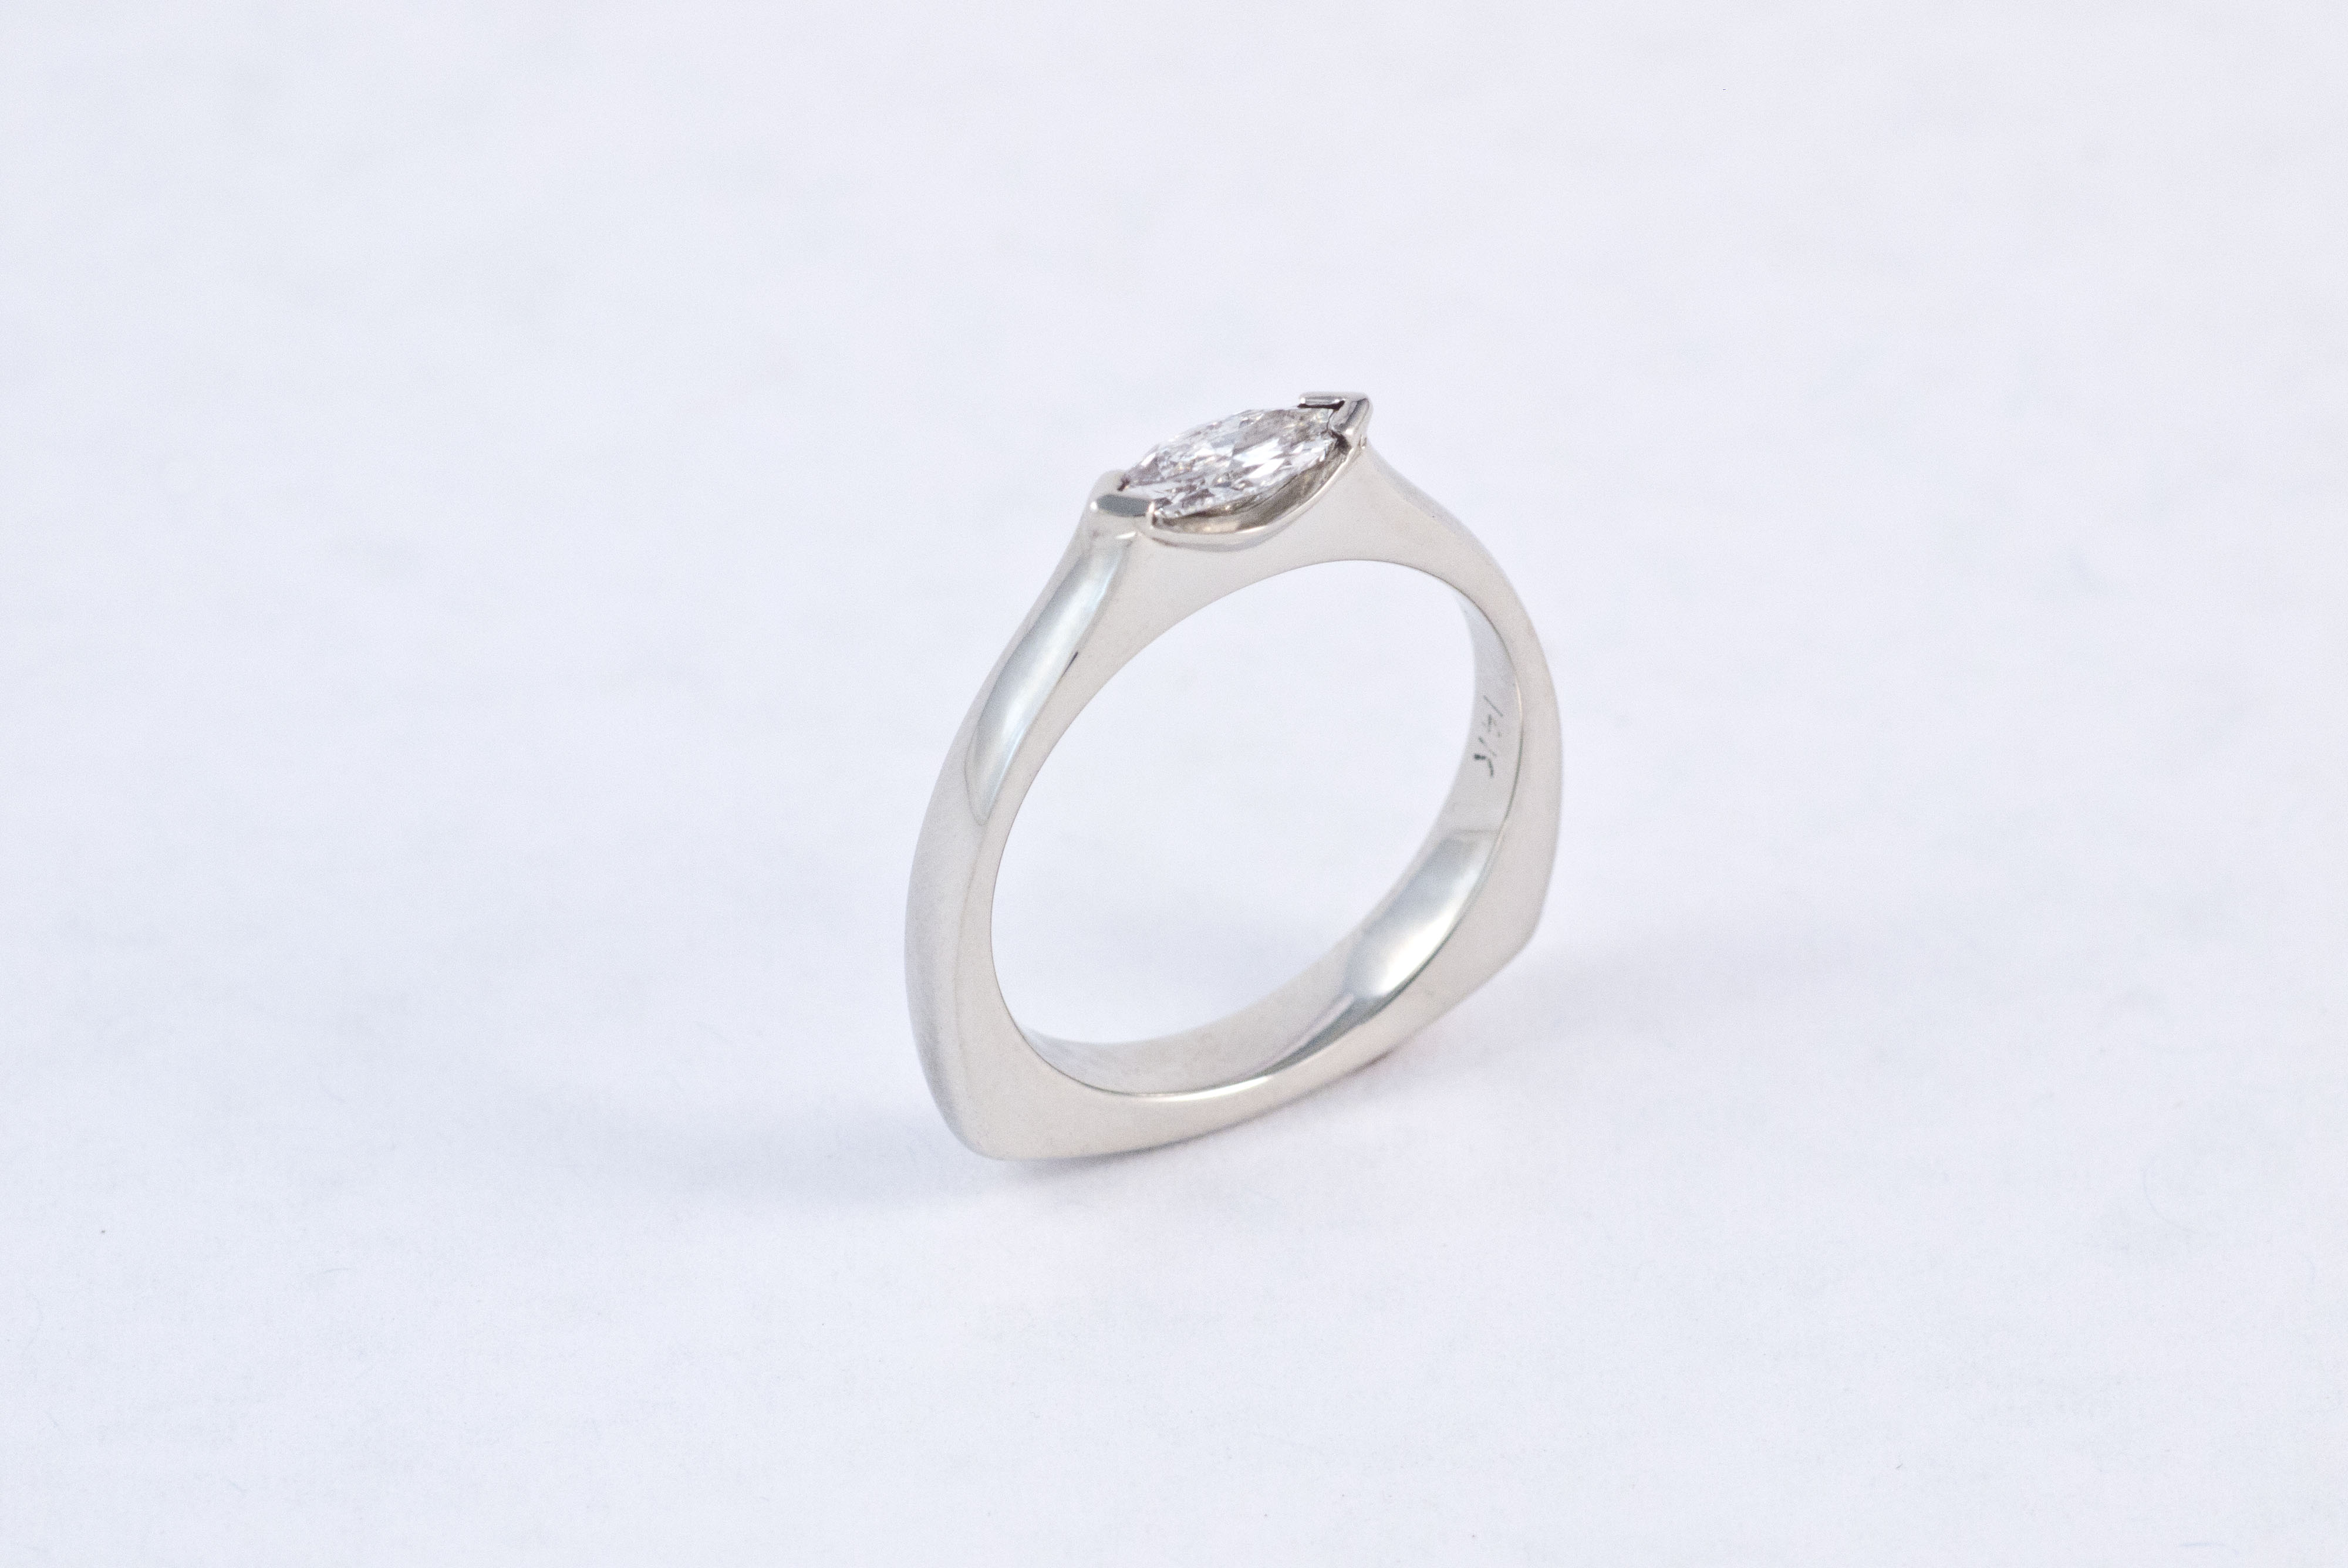 14k White Gold and diamond